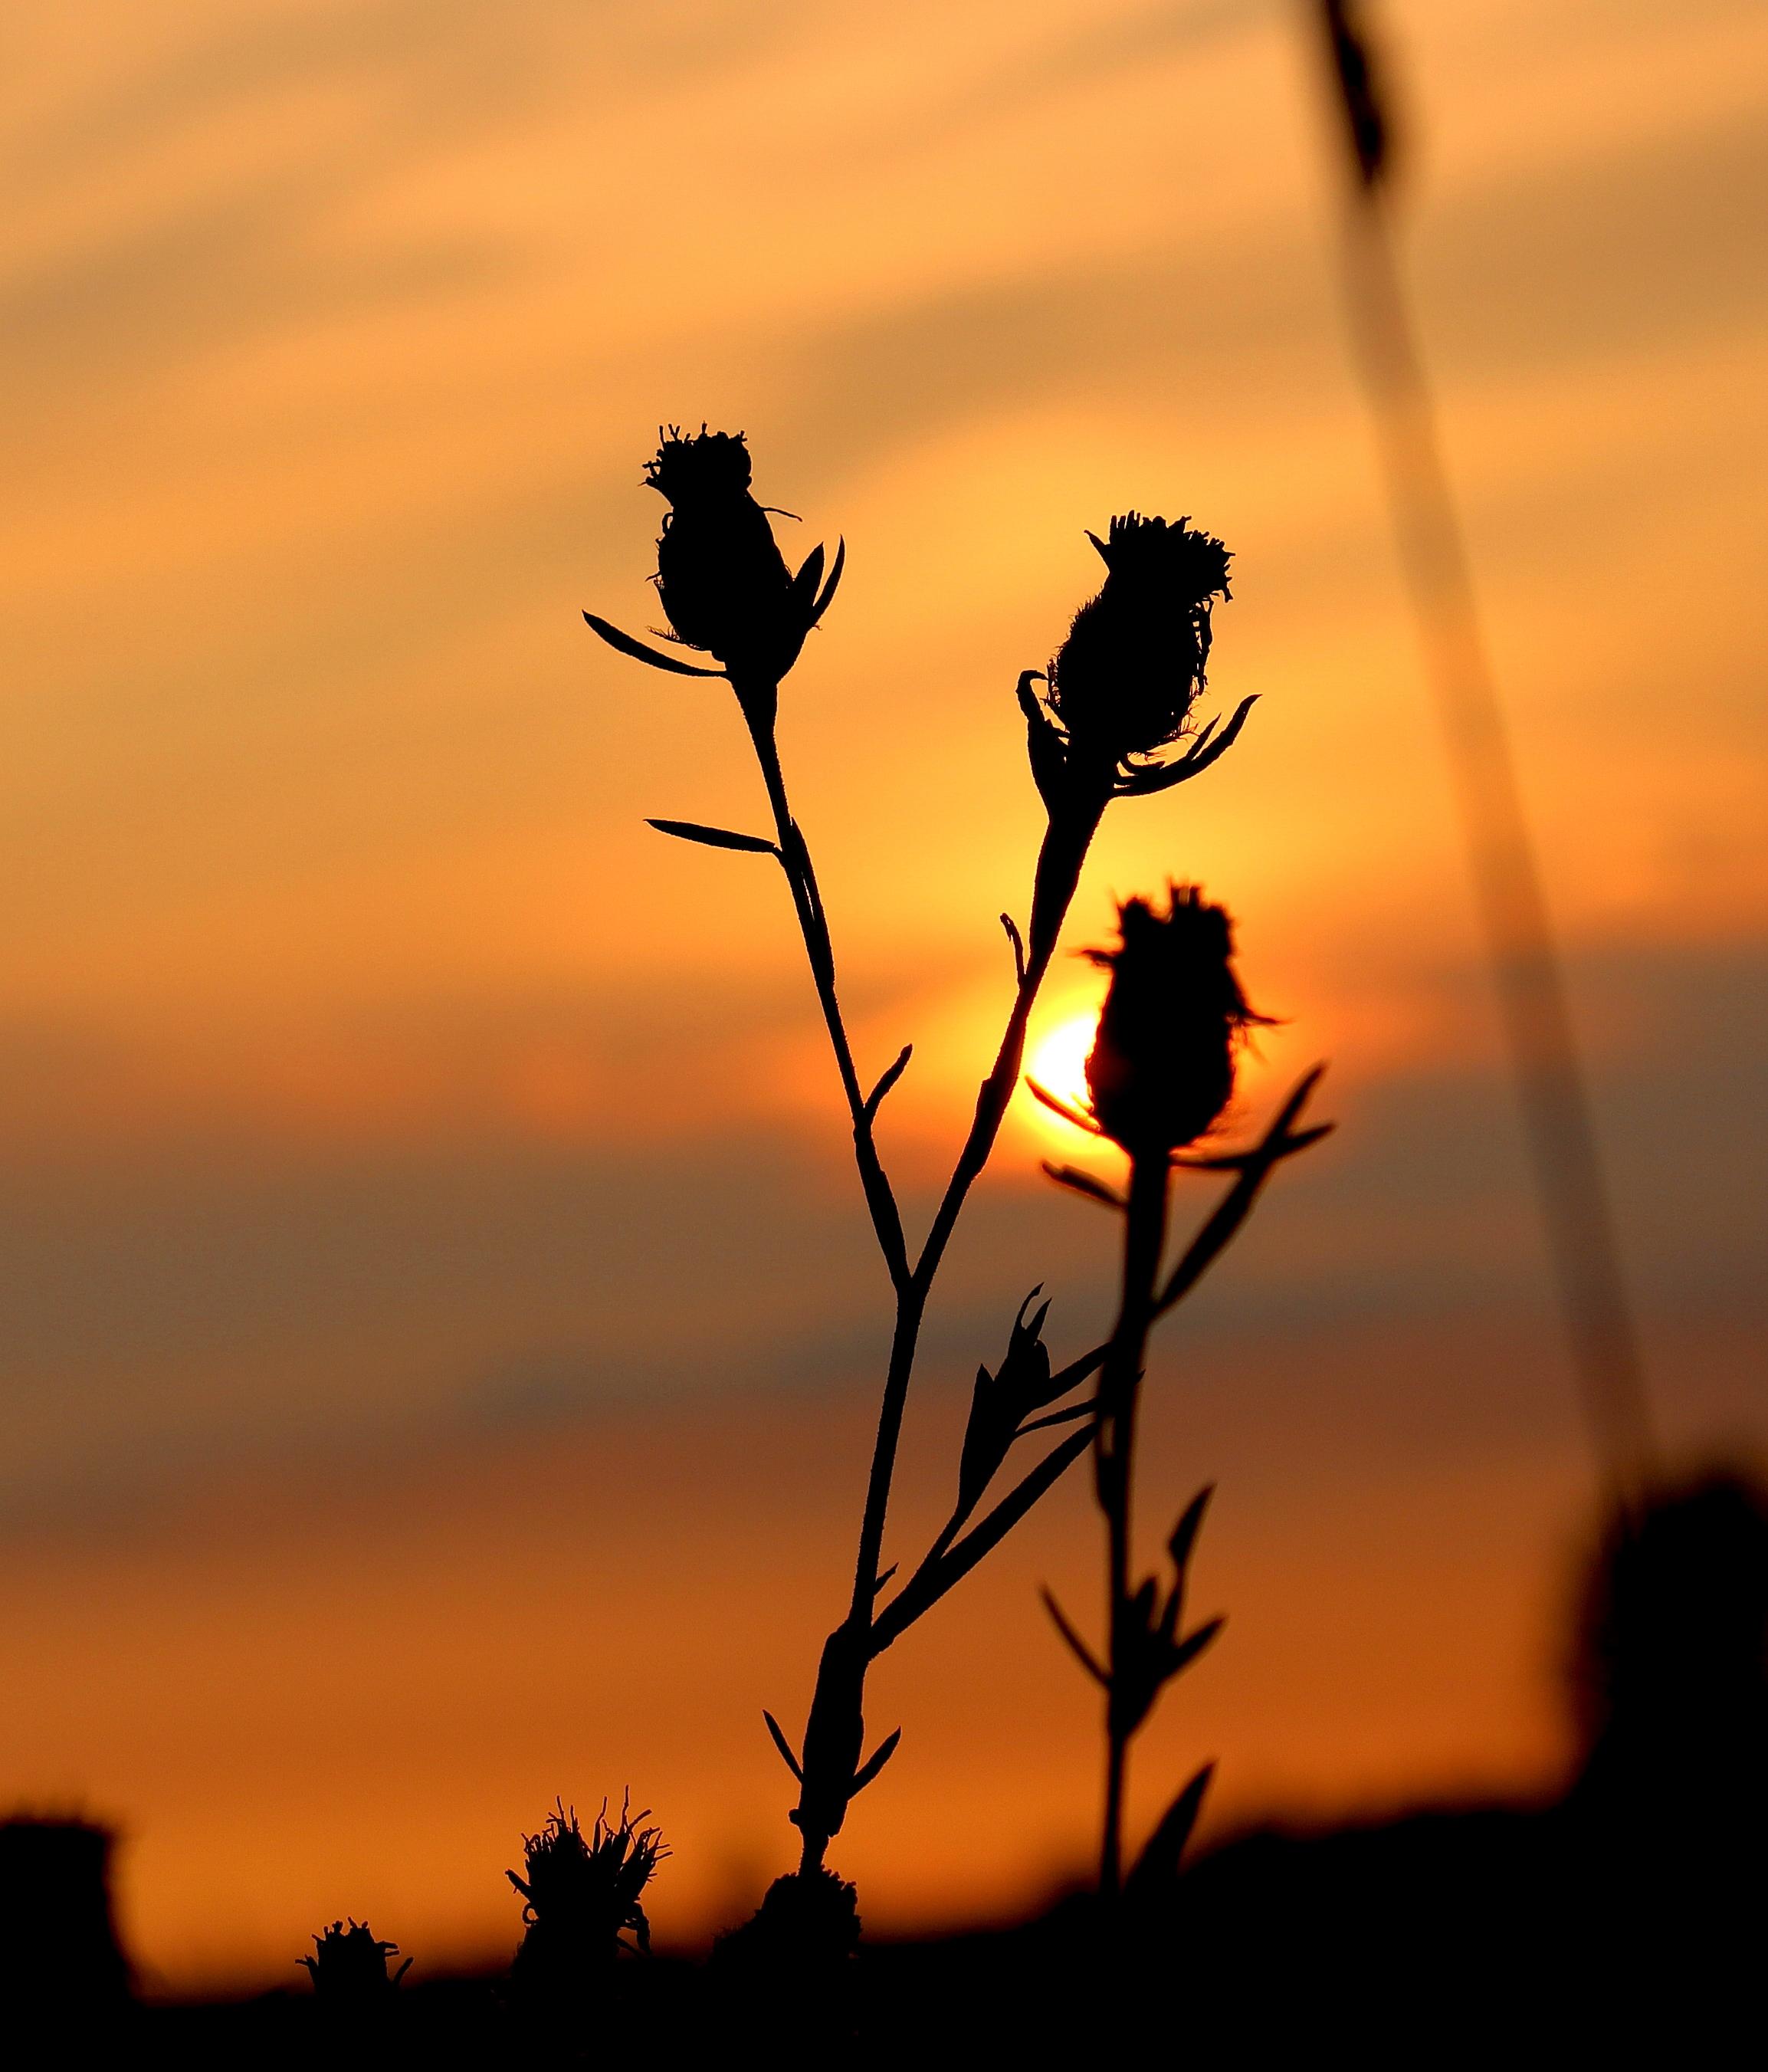 sunset8164